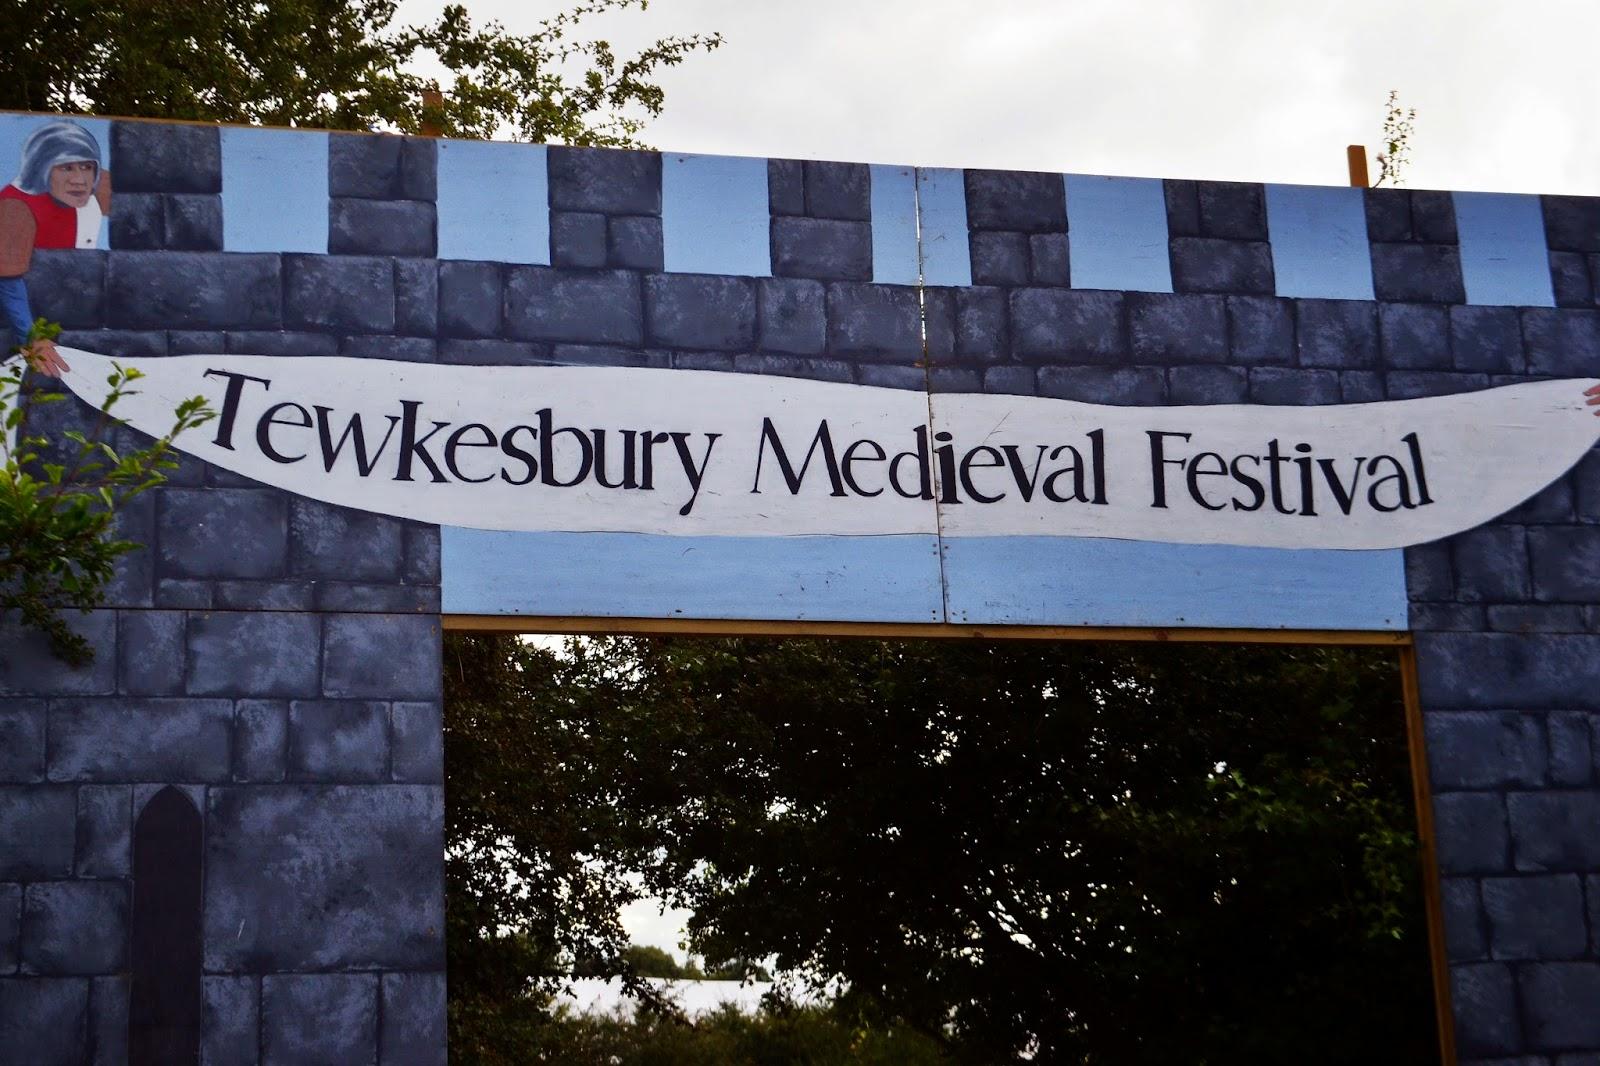 TEWKESBURY MEDIEVAL FESTIVAL ENTRANCE